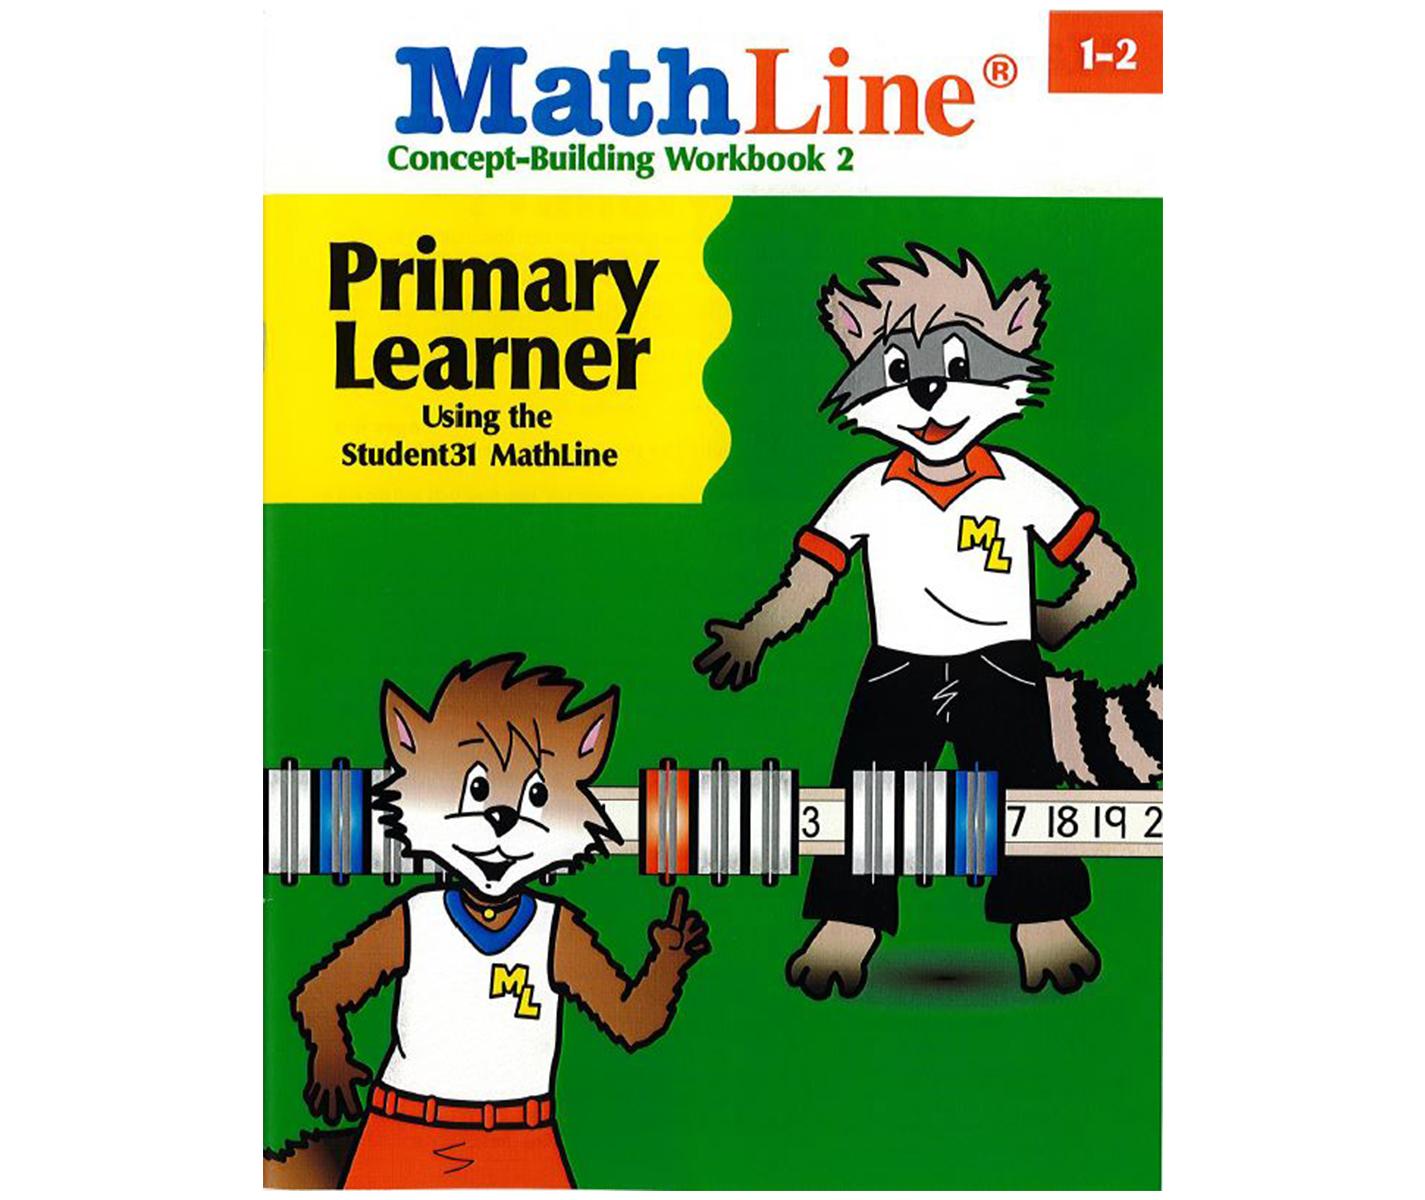 Mathline: Best tool for teaching math concepts